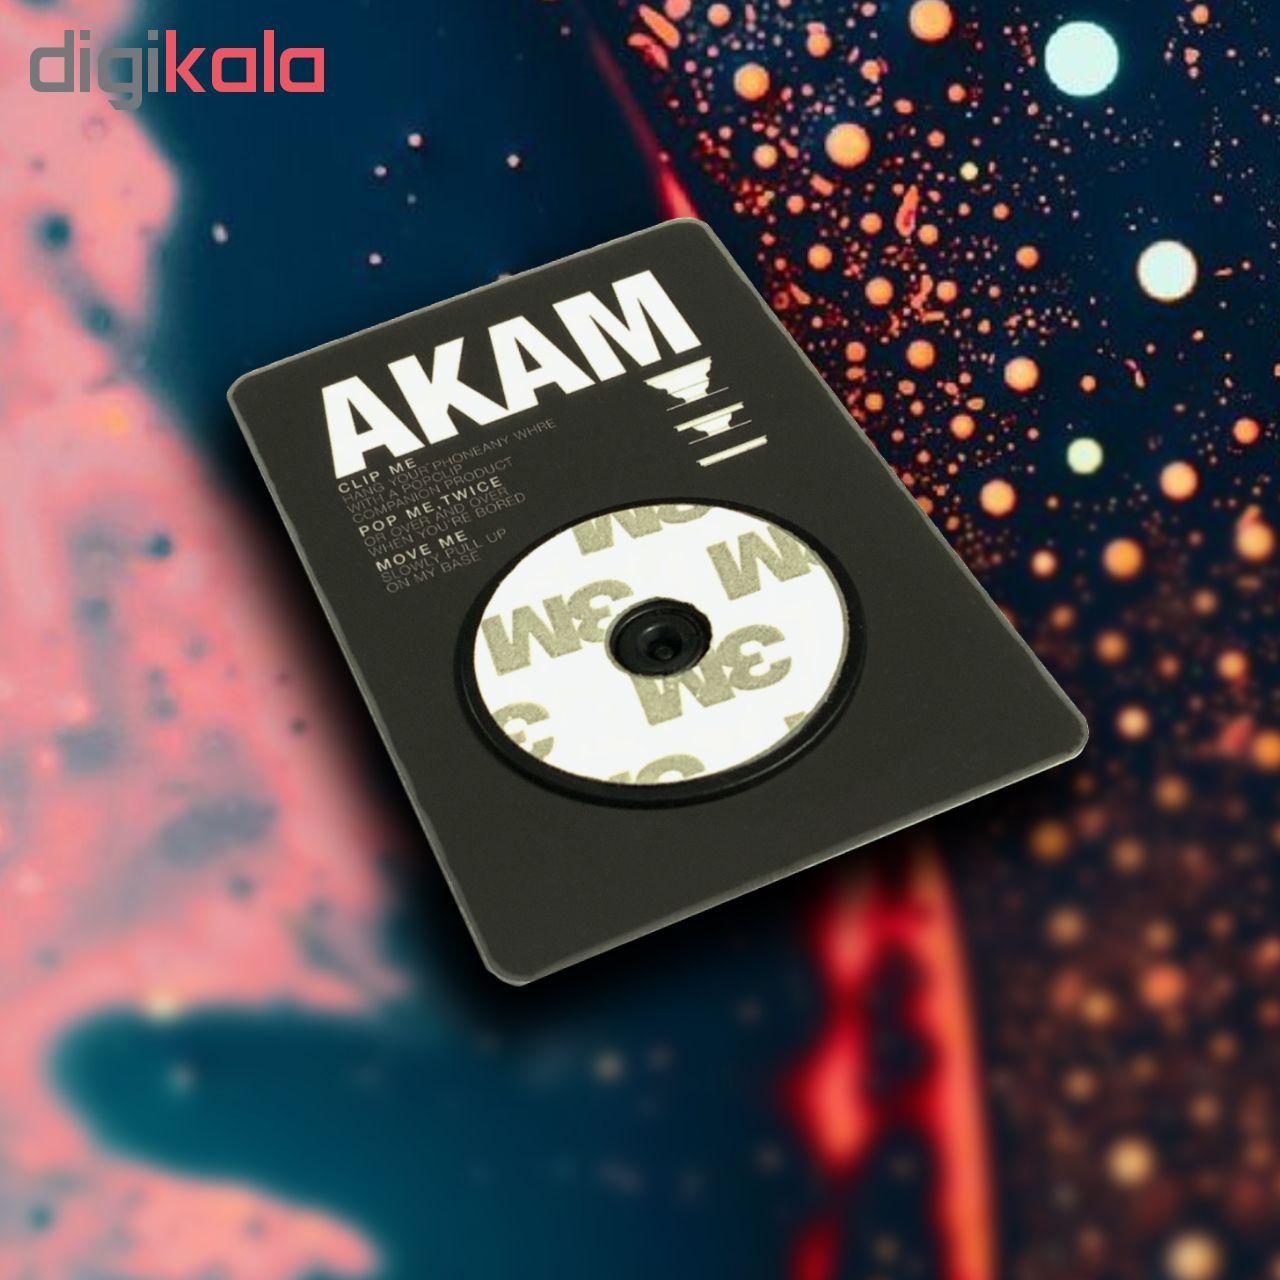 پایه نگهدارنده گوشی موبایل پاپ سوکت آکام مدل APS0068 main 1 2